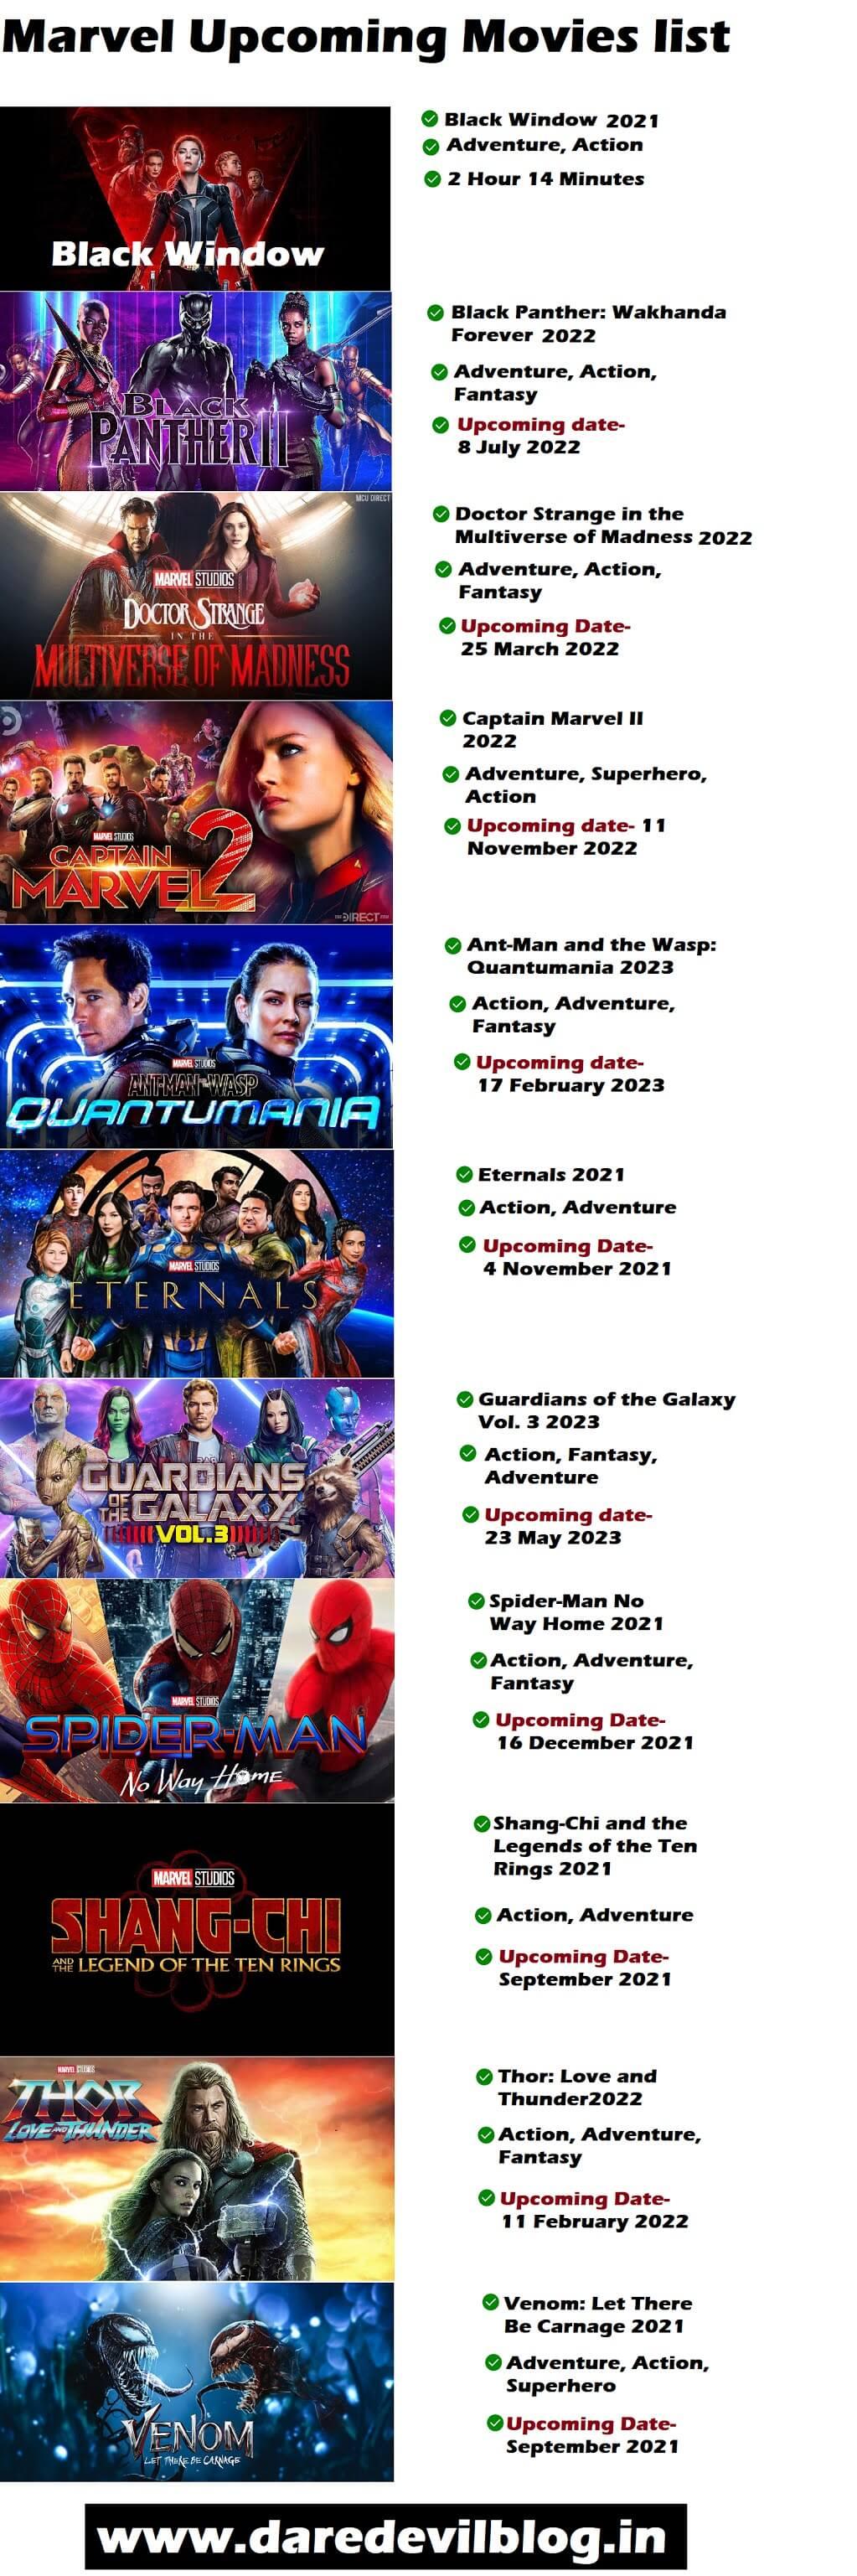 Marvel Upcoming Movies List 2021`